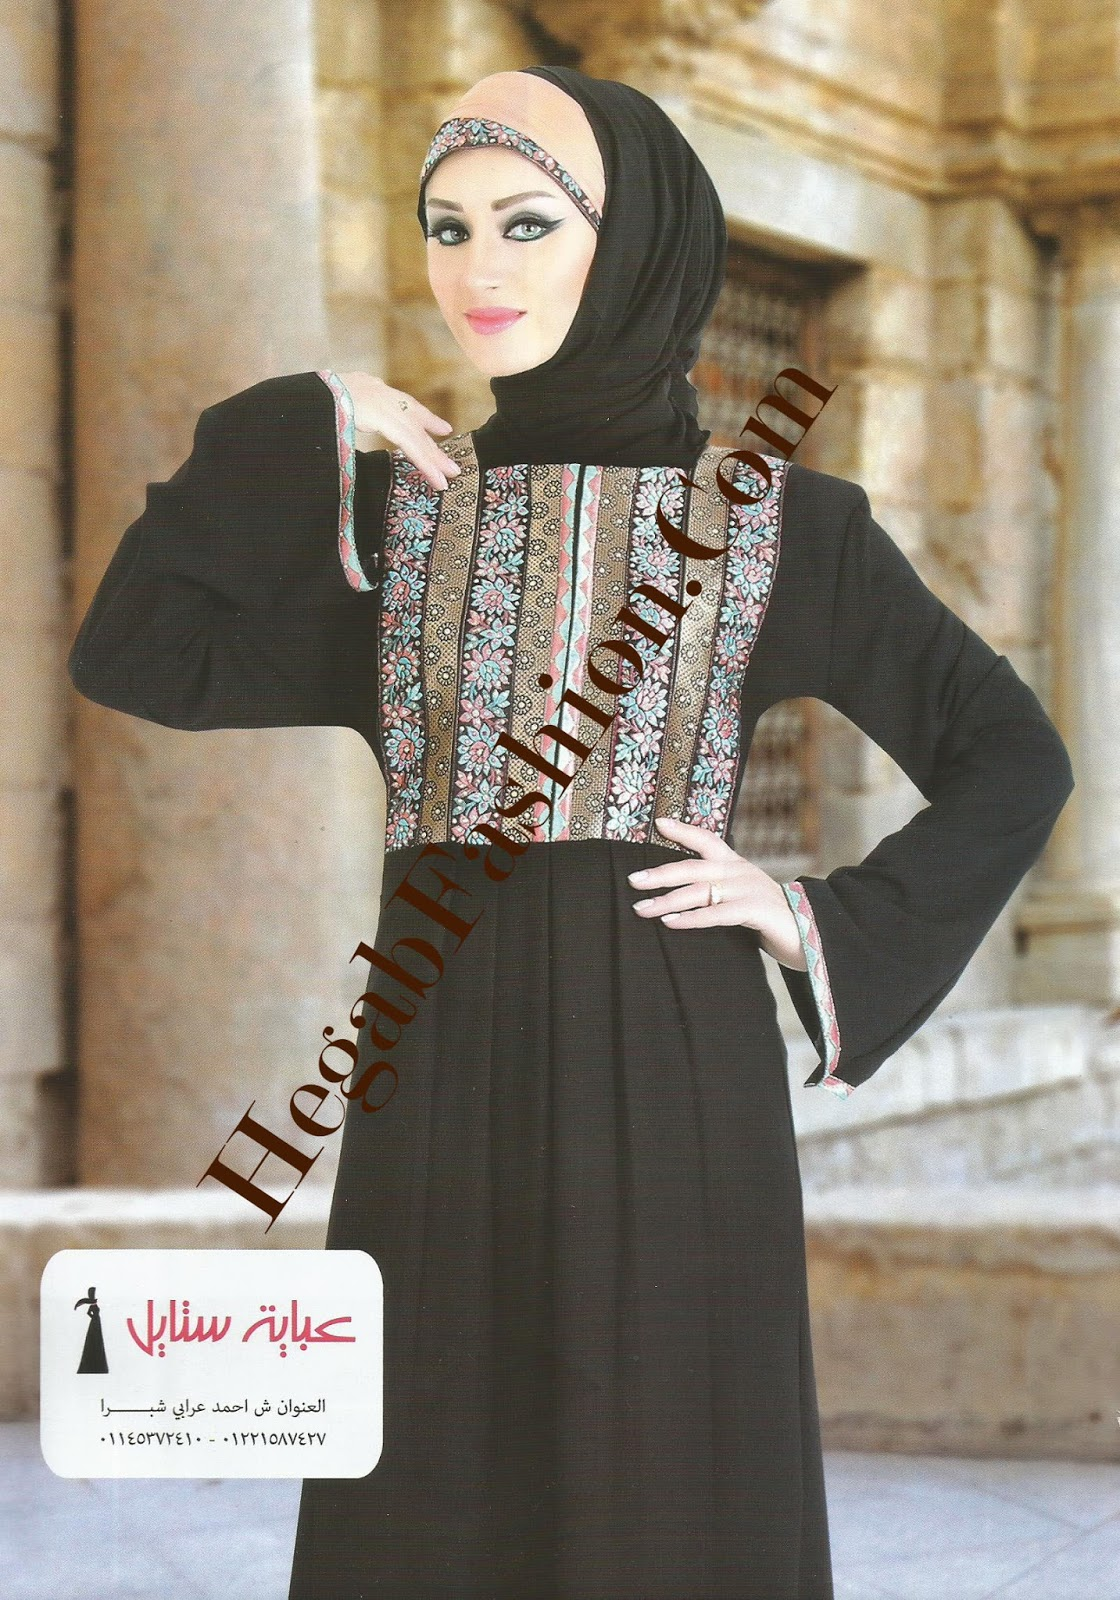 024daf121 مجلة حجاب فاشون - Hijab Fashion Magazine: أزياء عباية ستايل - مجلة ...